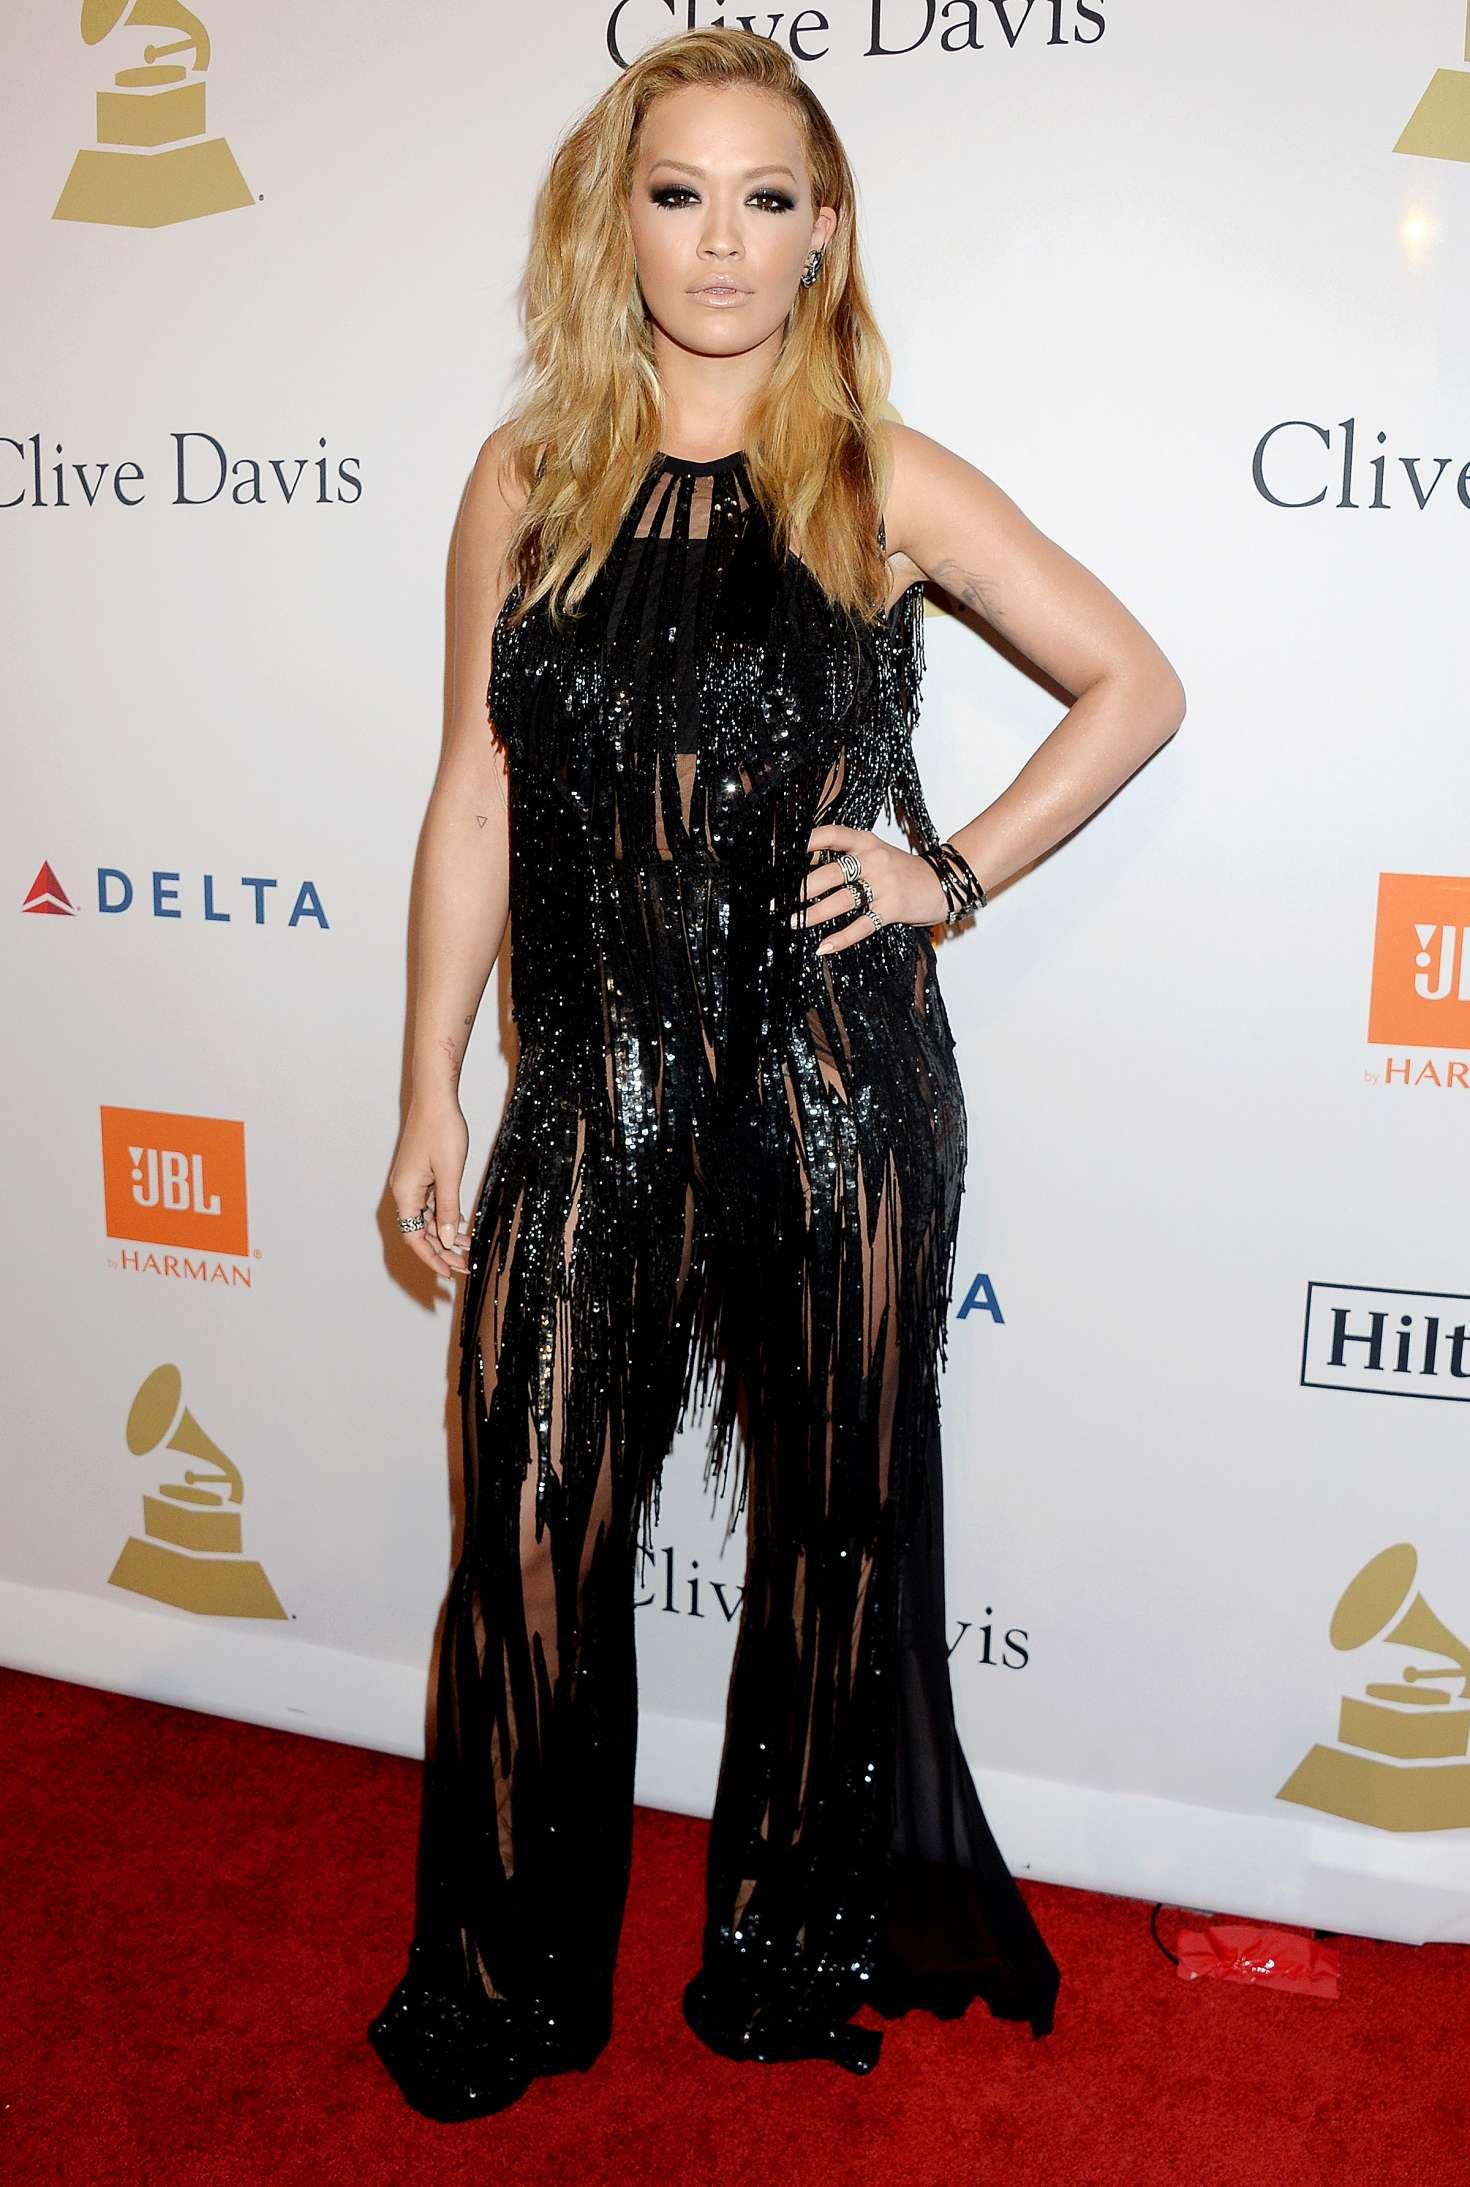 Rita Ora 2017 : Rita Ora: Clive Davis Pre-Grammy Party 2017 -04